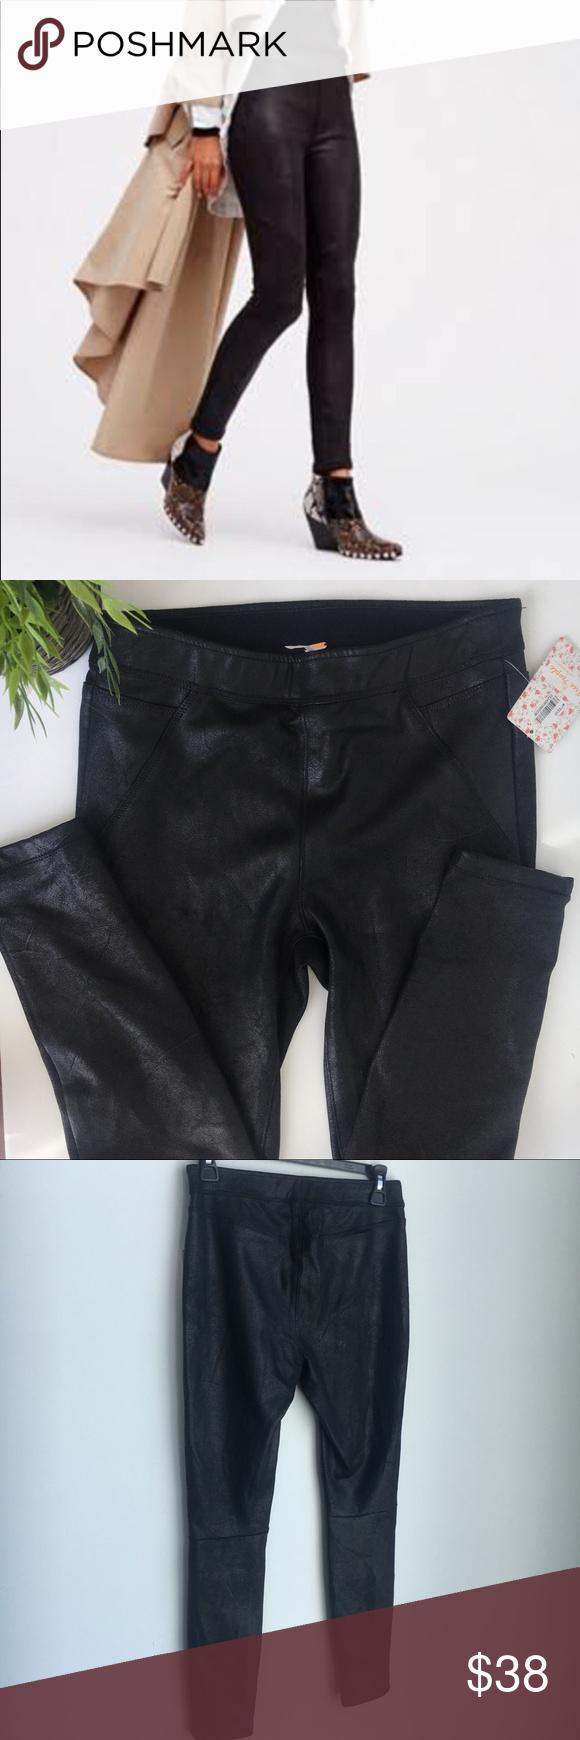 8775b1cd1ce459 FREE PEOPLE never let you go faux leather leggings Super soft faux suede  design black leggings